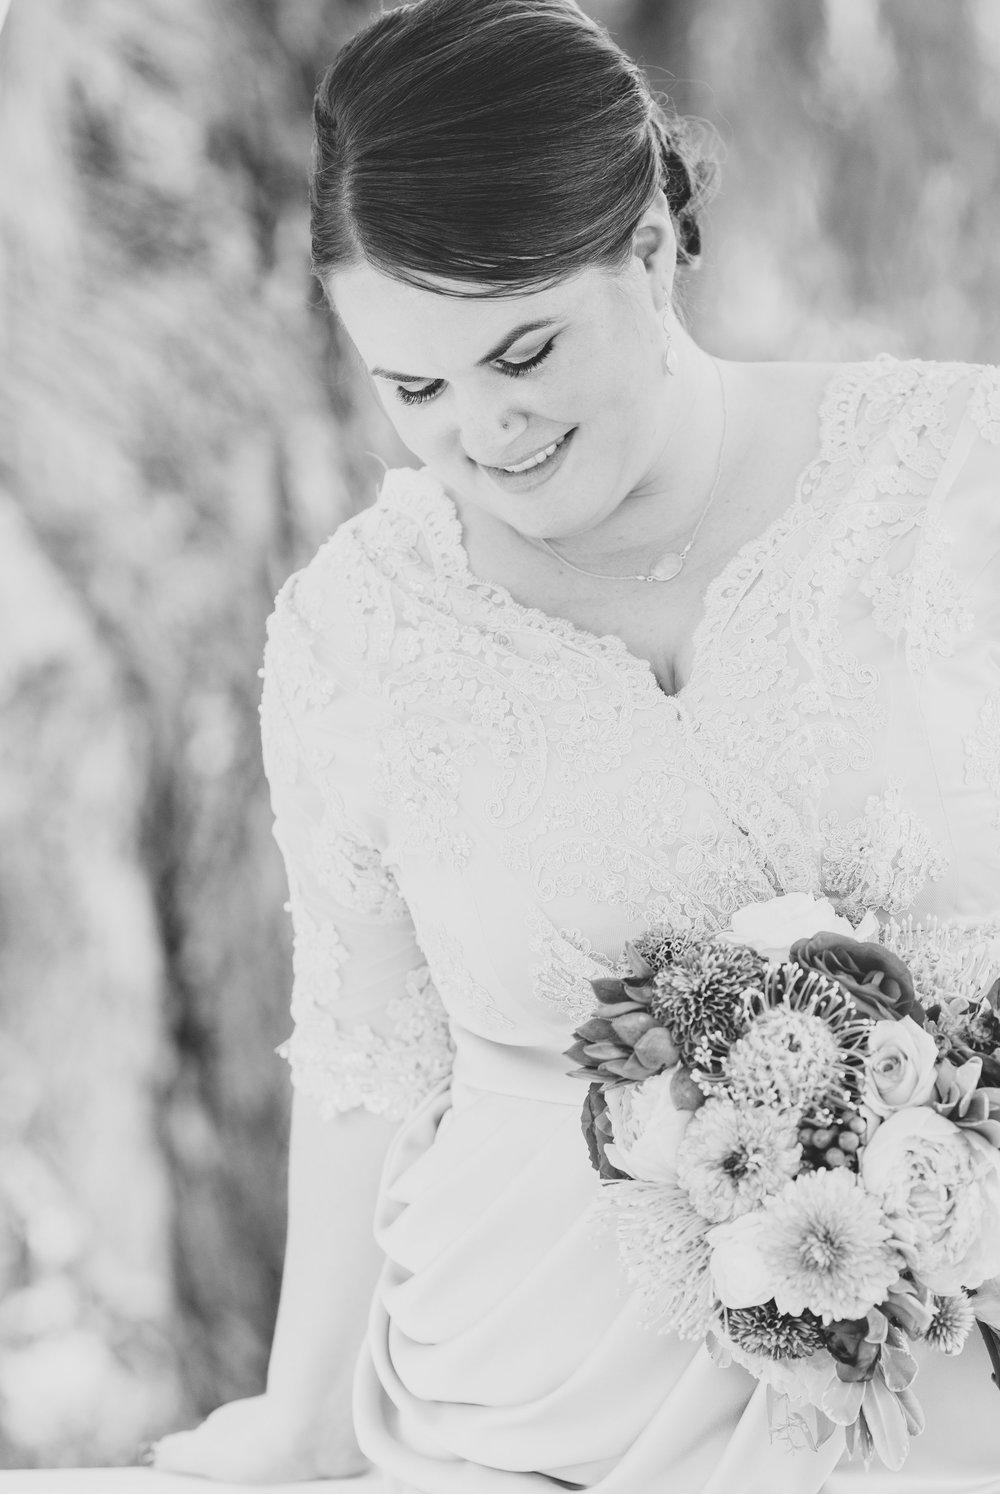 jessica-black-and-white-bride-looks-down-dramatic